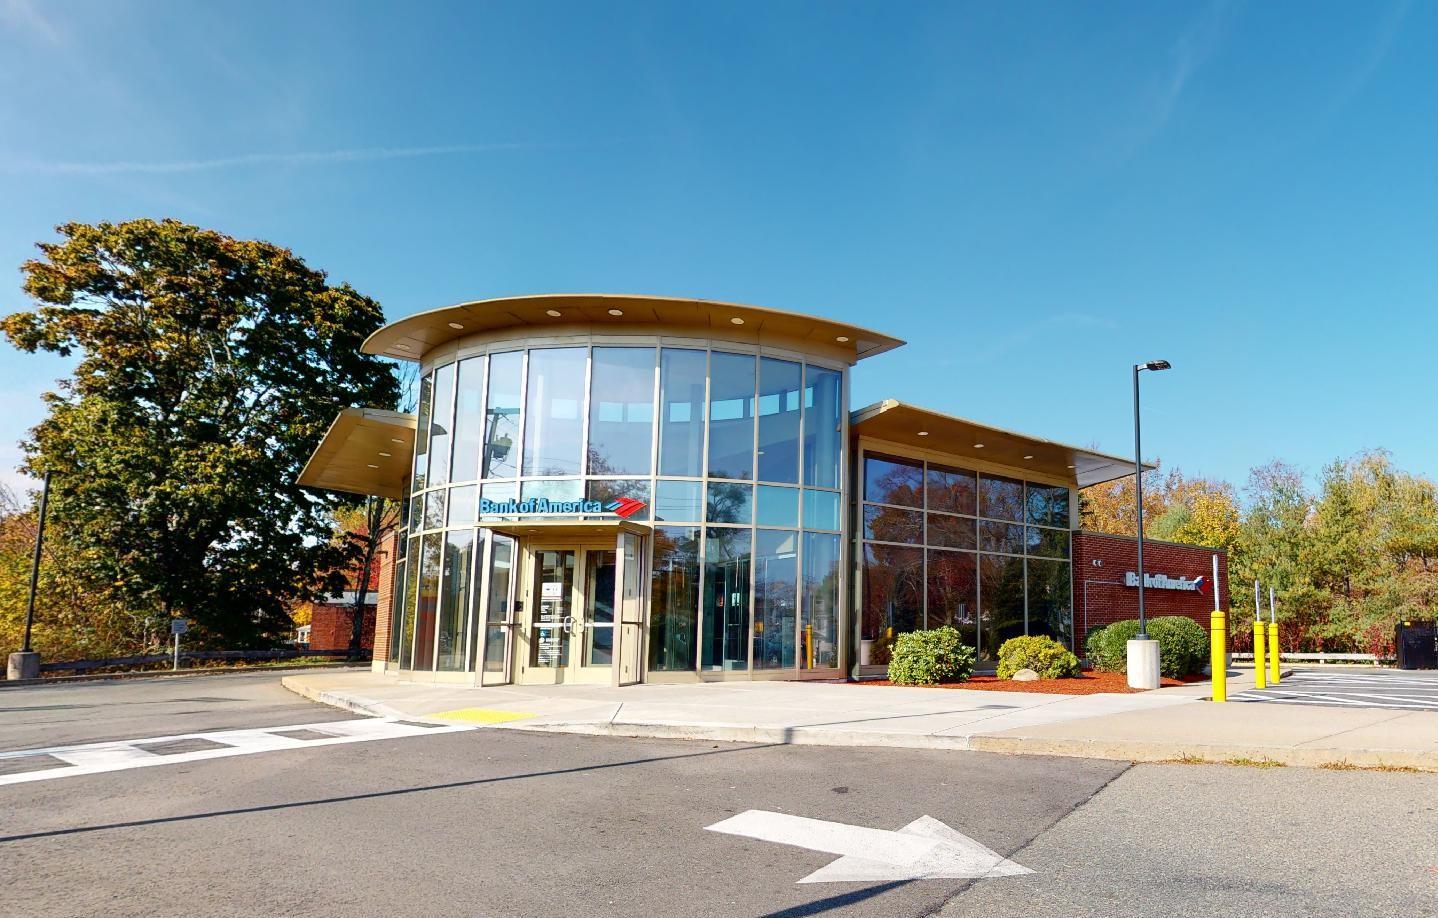 Bank of America financial center with drive-thru ATM | 93 Brockton Ave, Abington, MA 02351